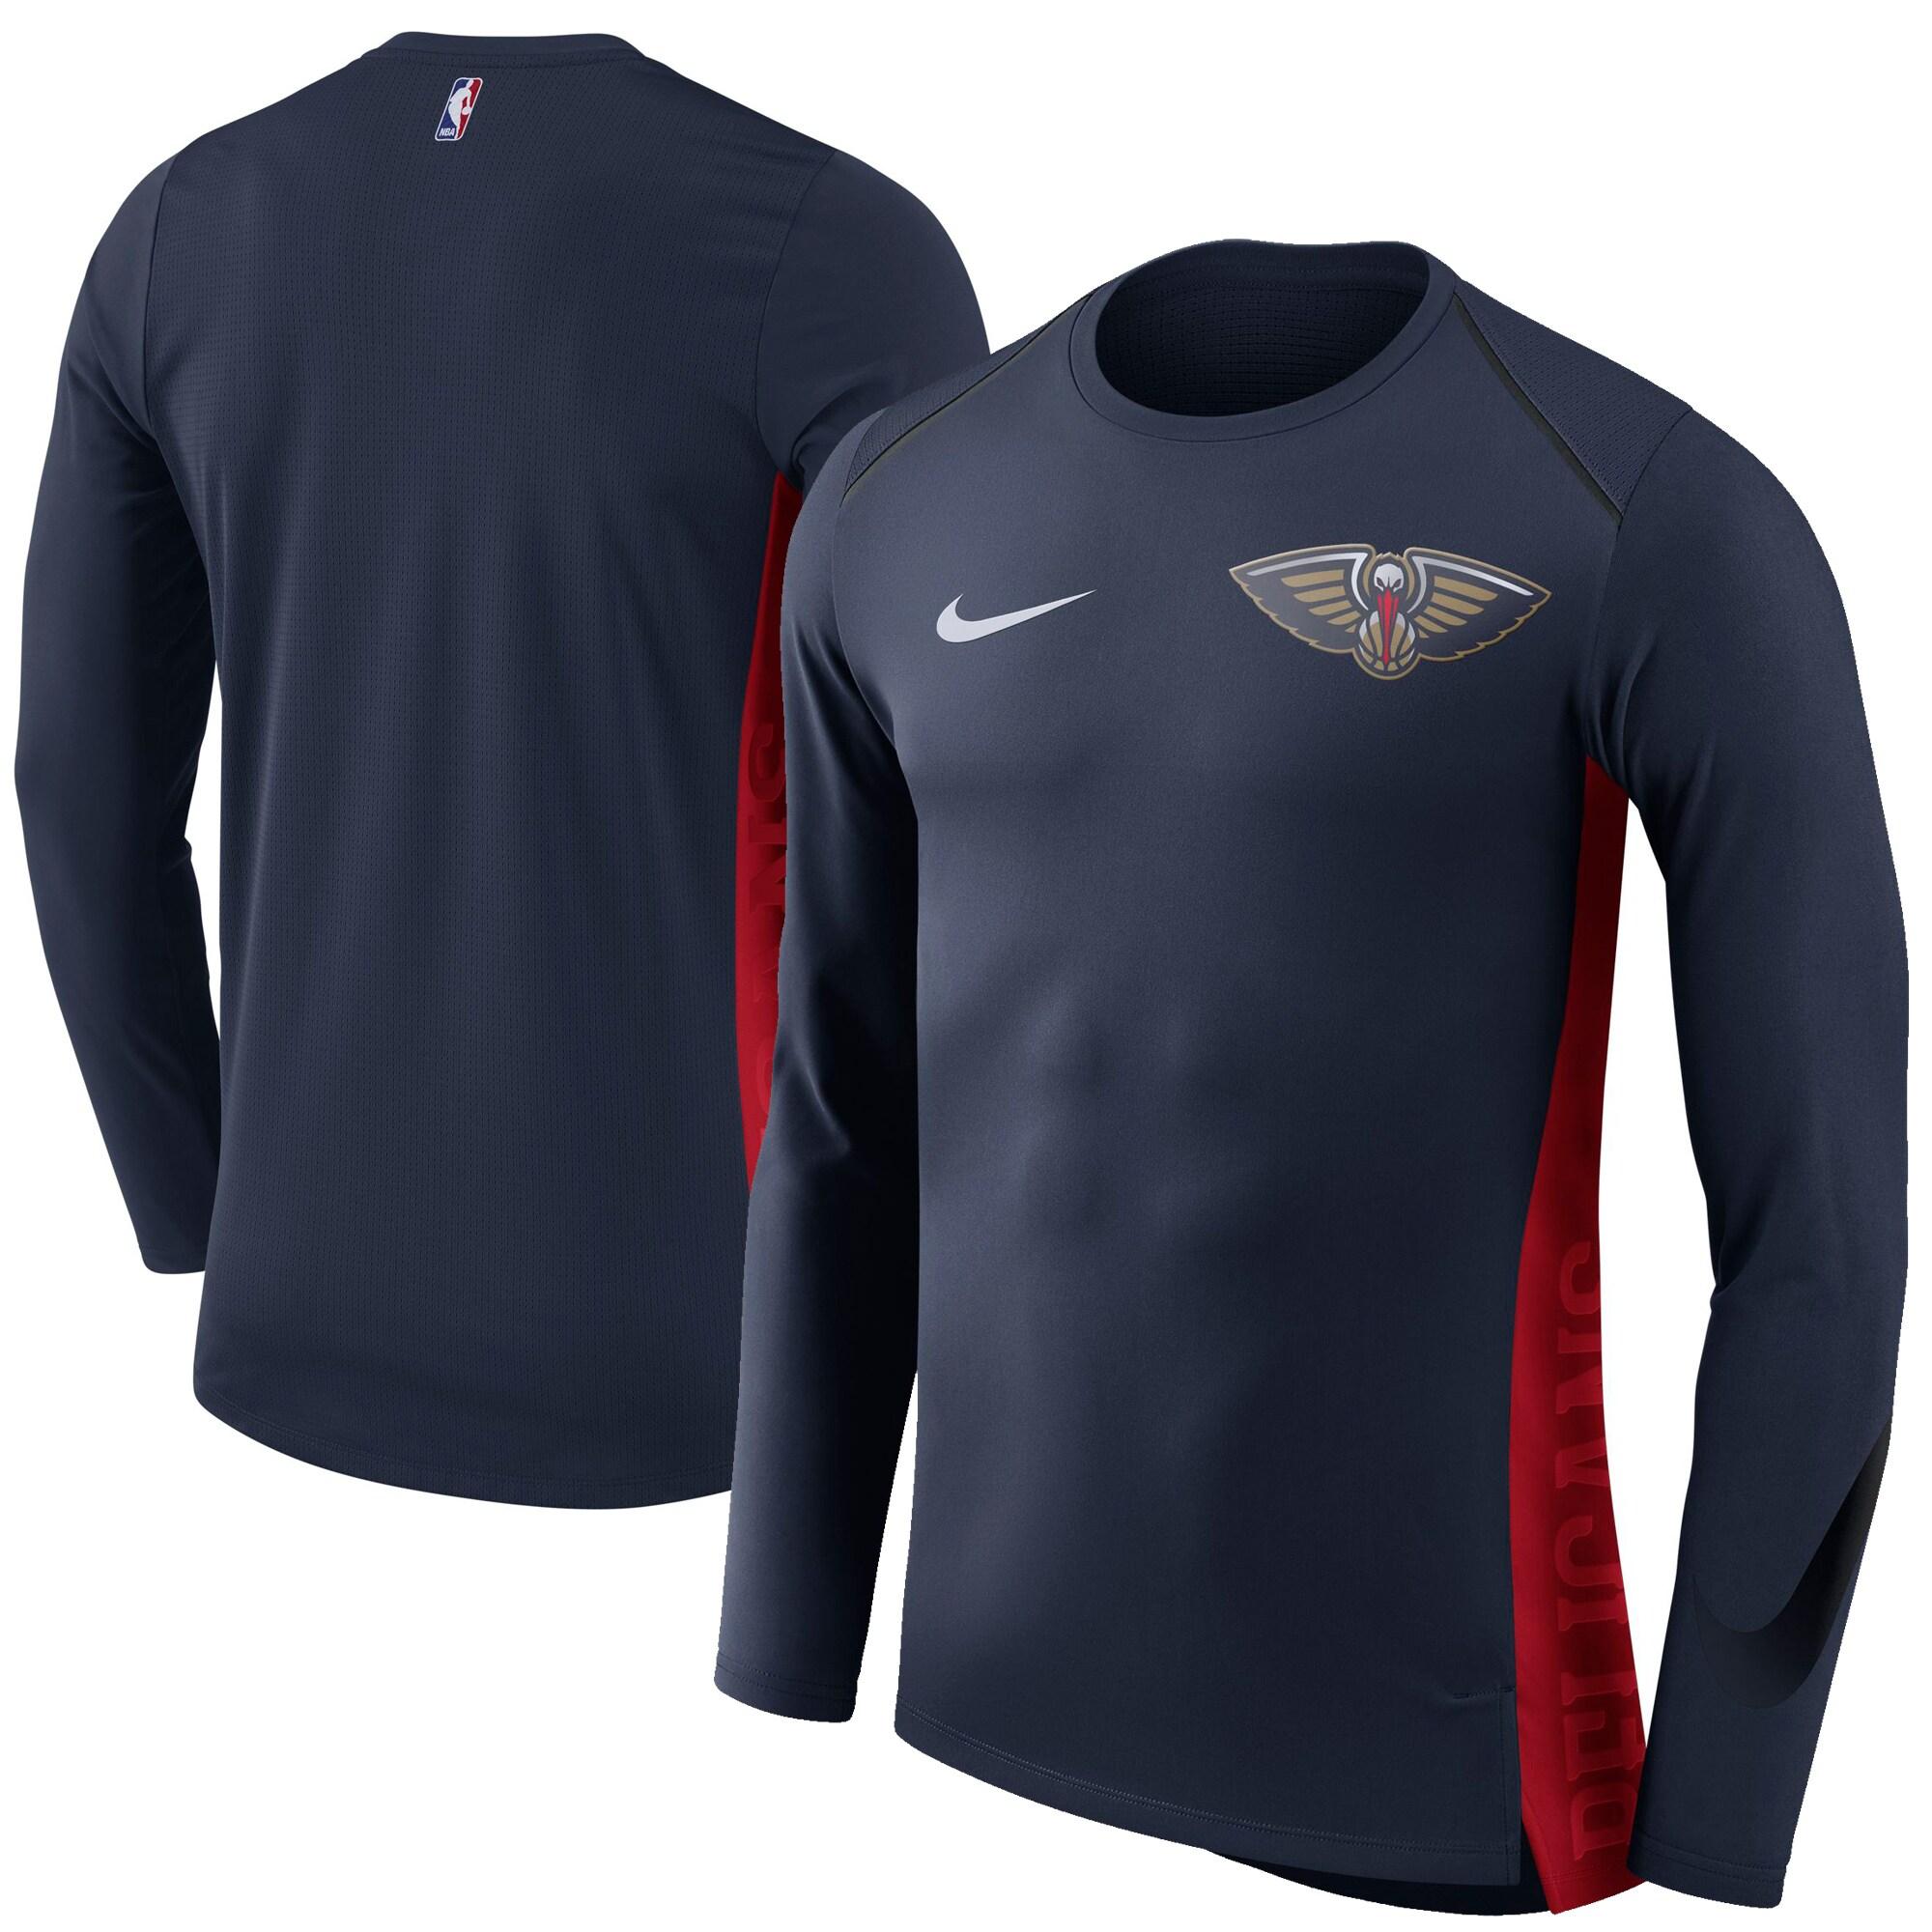 New Orleans Pelicans Nike Elite Shooter Performance Long Sleeve T-Shirt - Navy